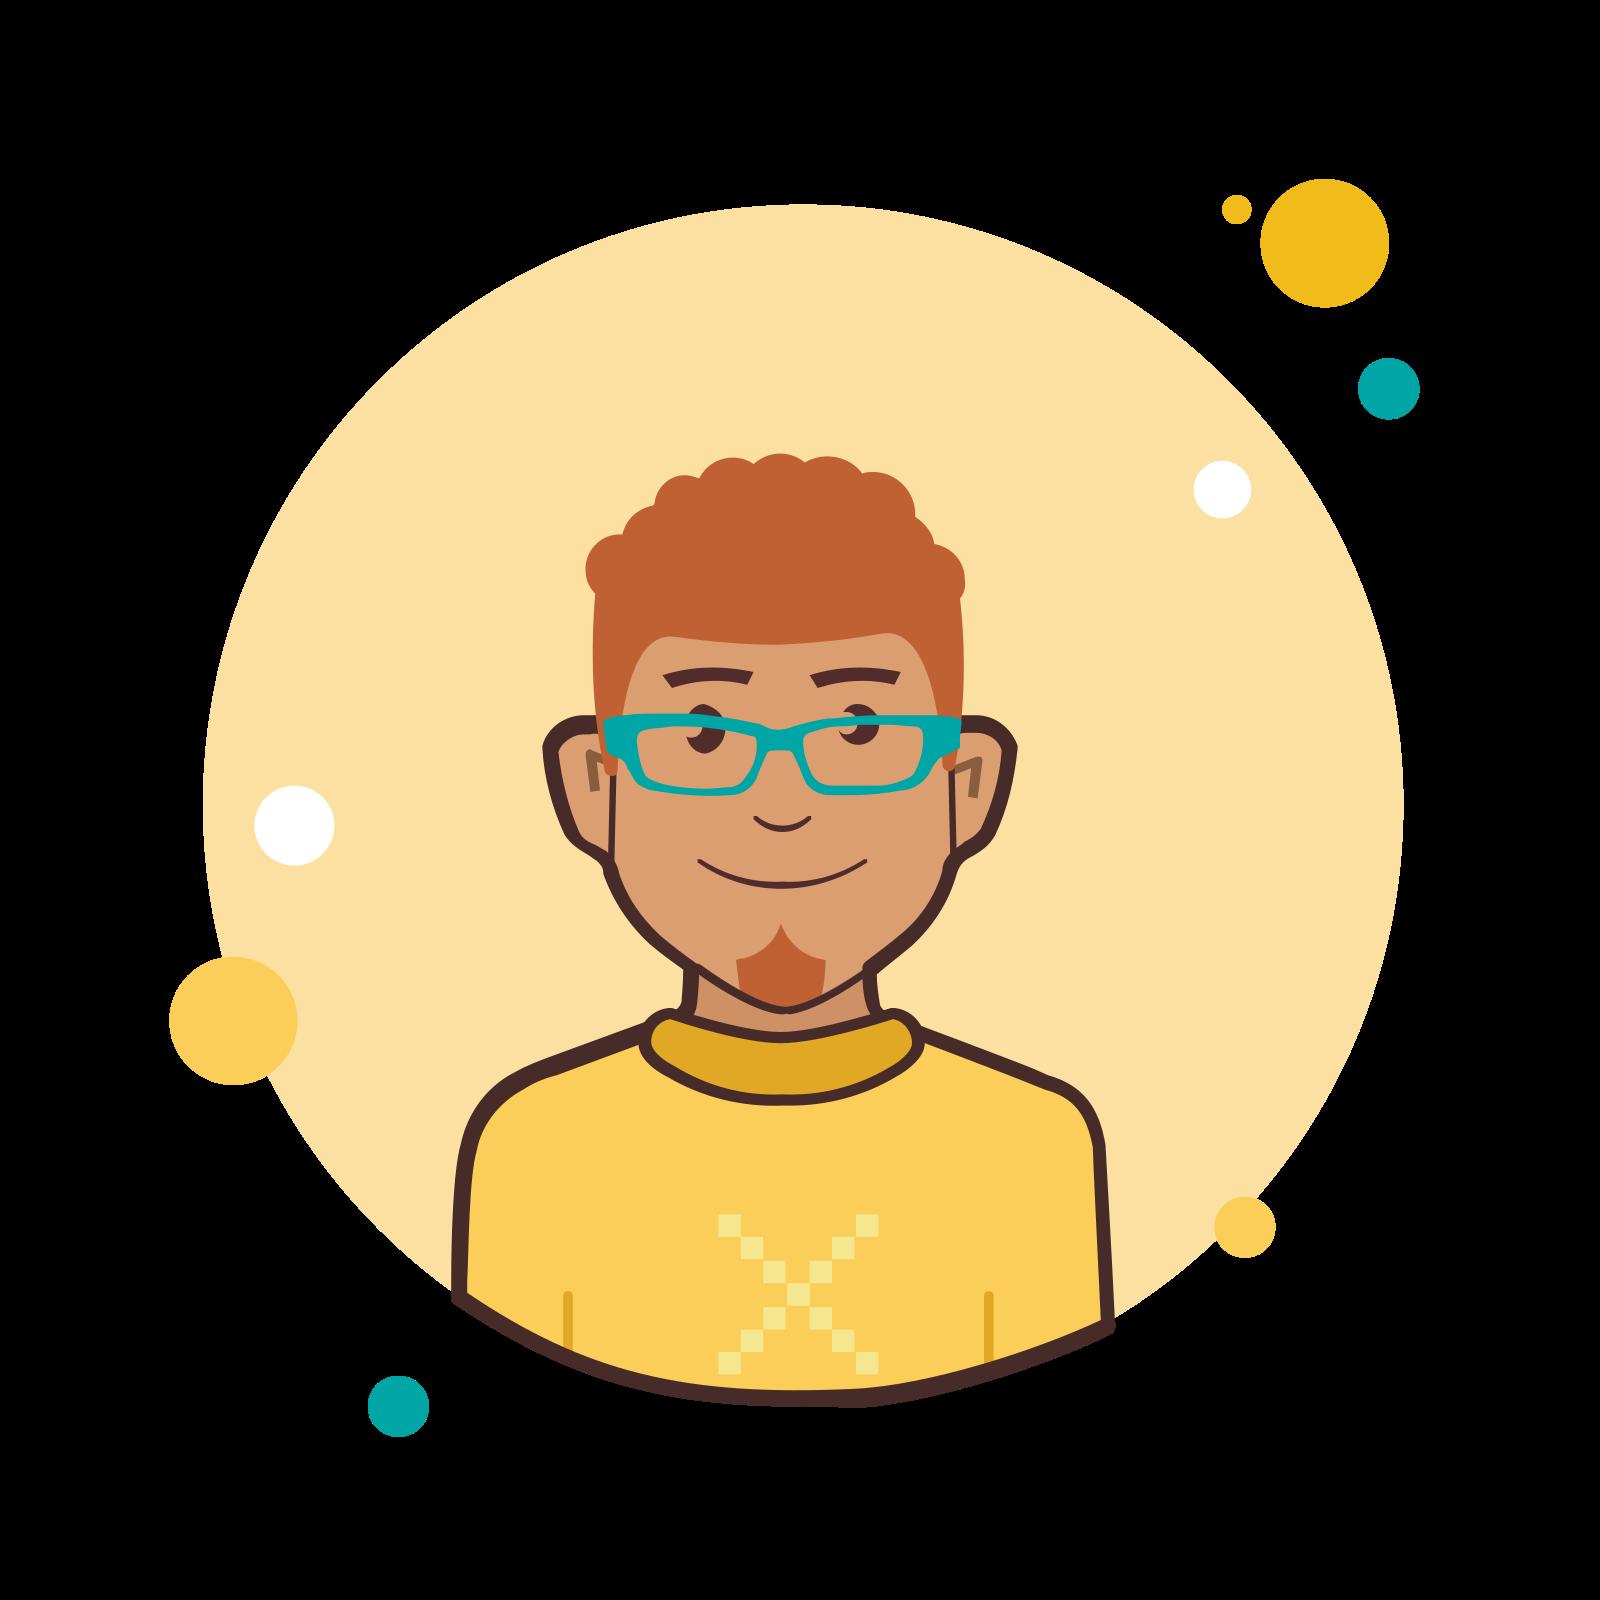 Ginger Man in Yellow Shirt icon